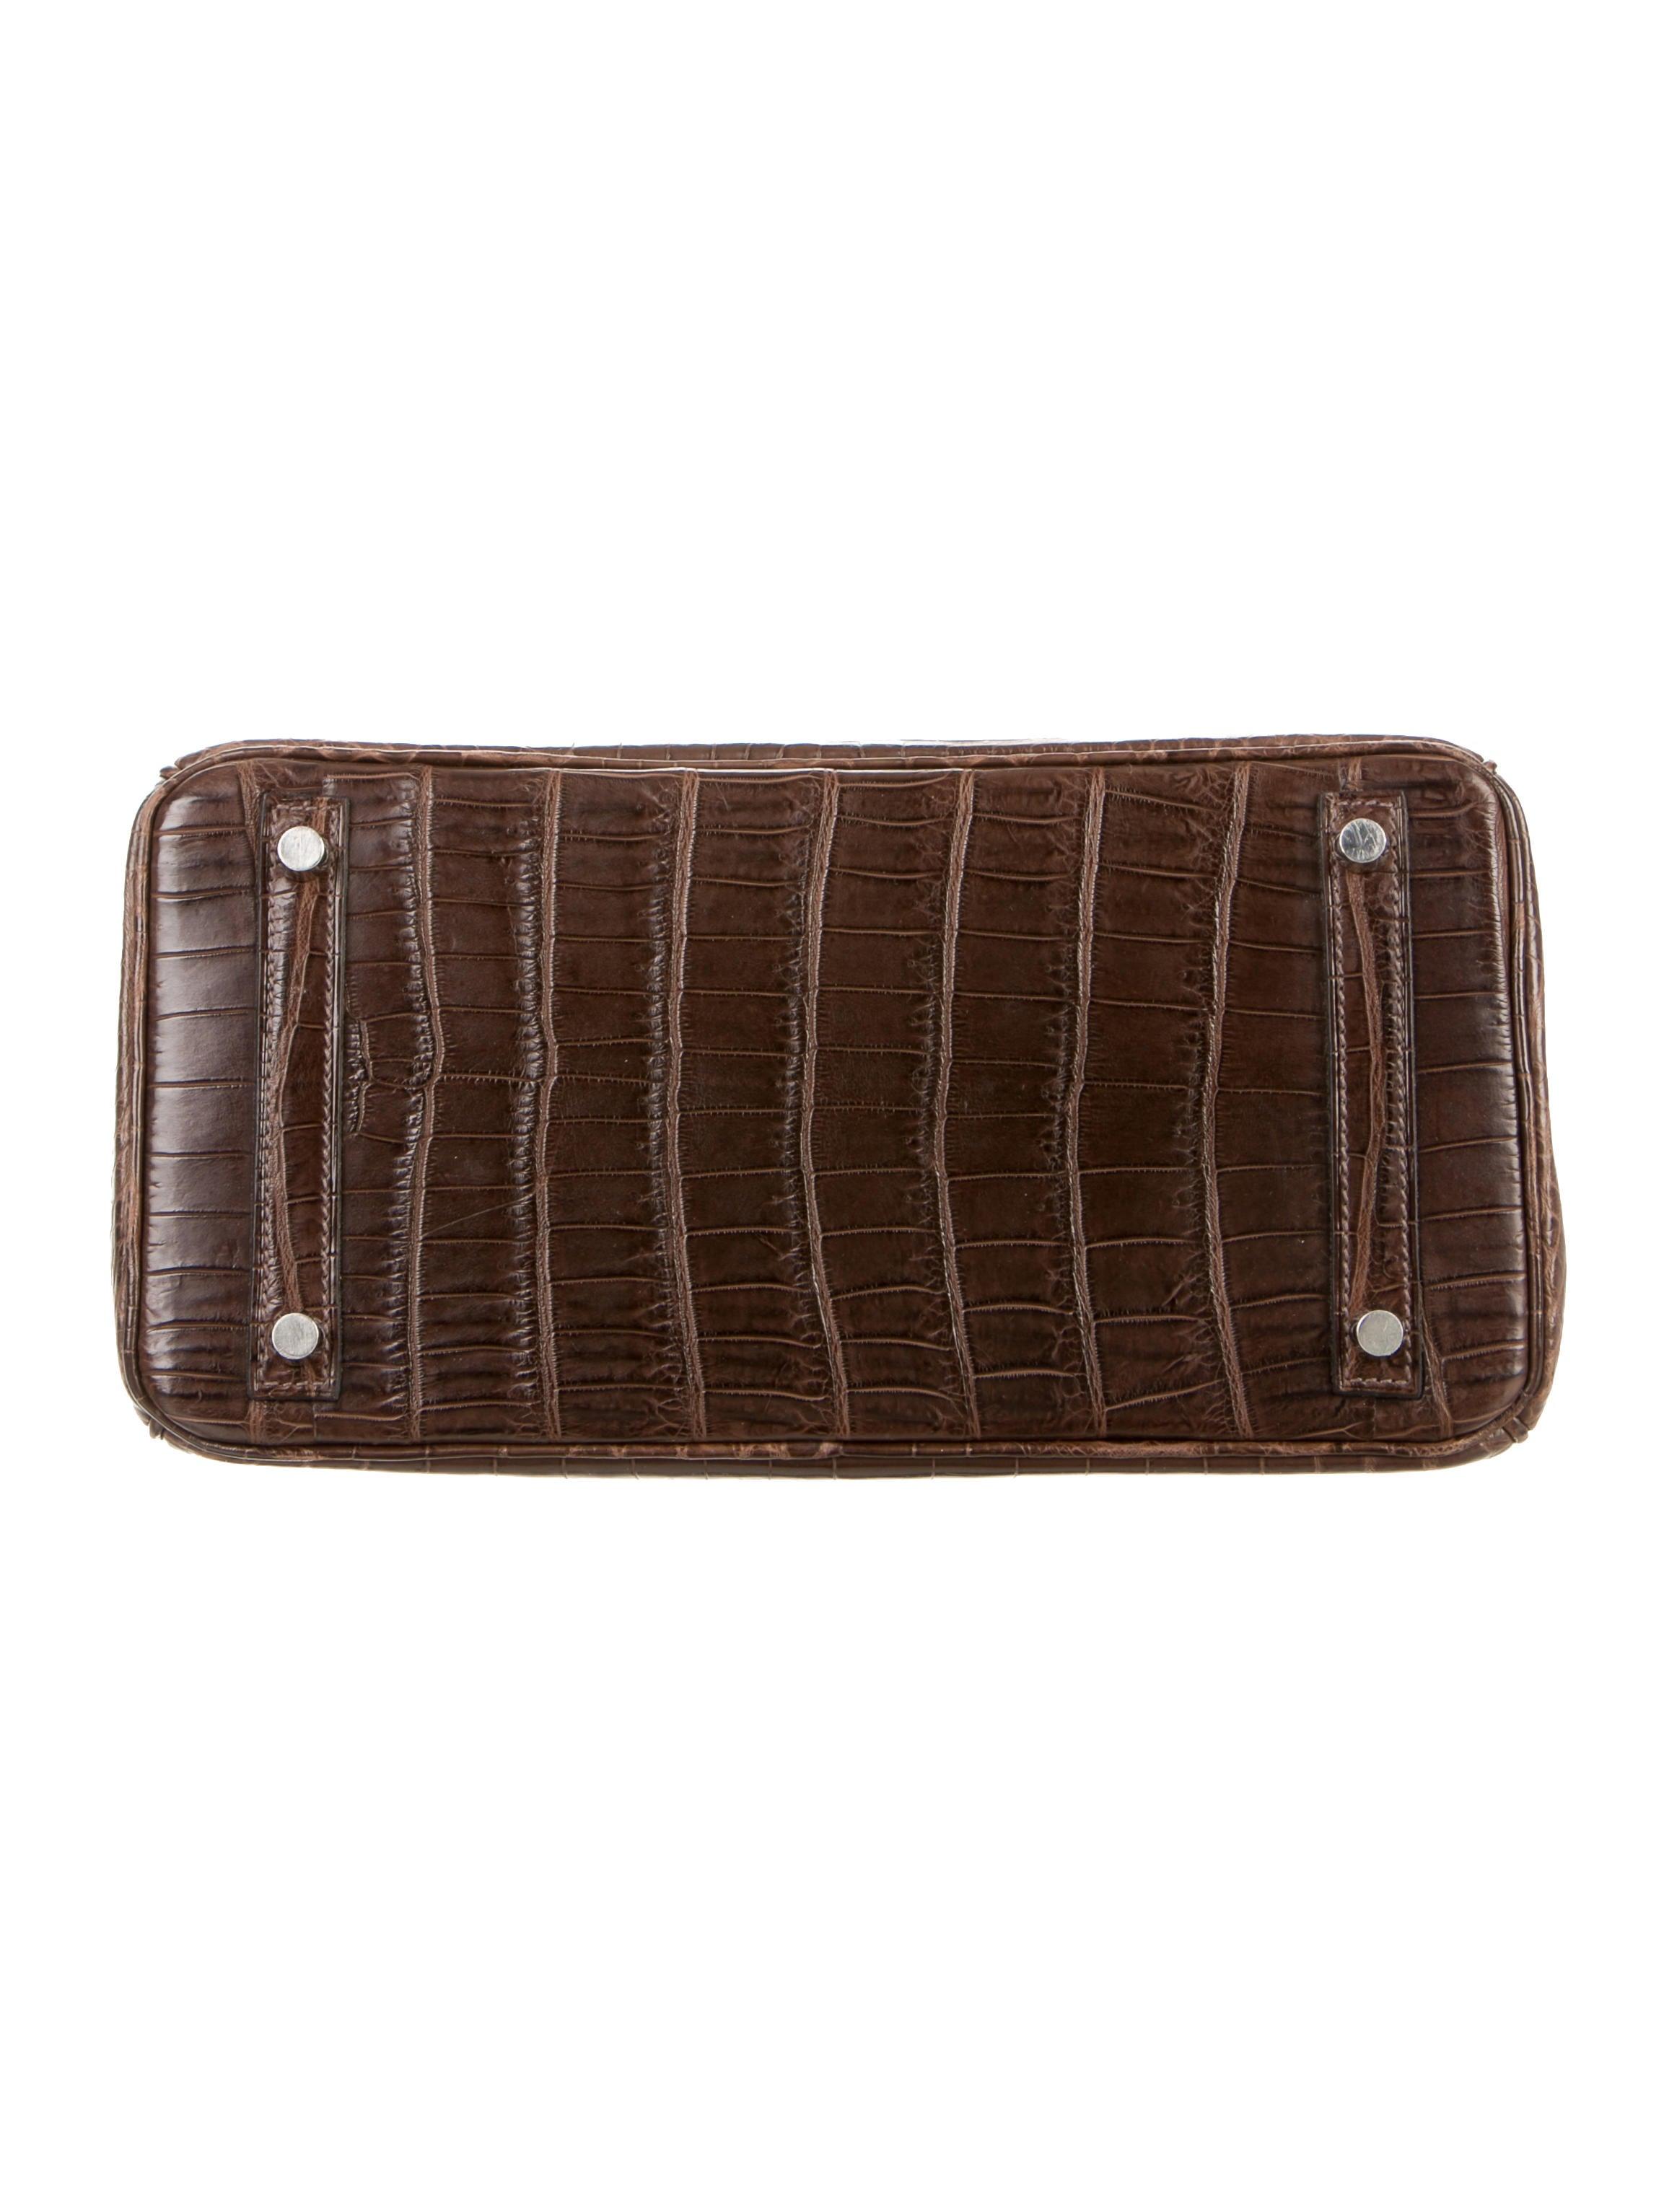 Hermès Niloticus Crocodile Birkin 30 - Handbags - HER78784  b904a539e0